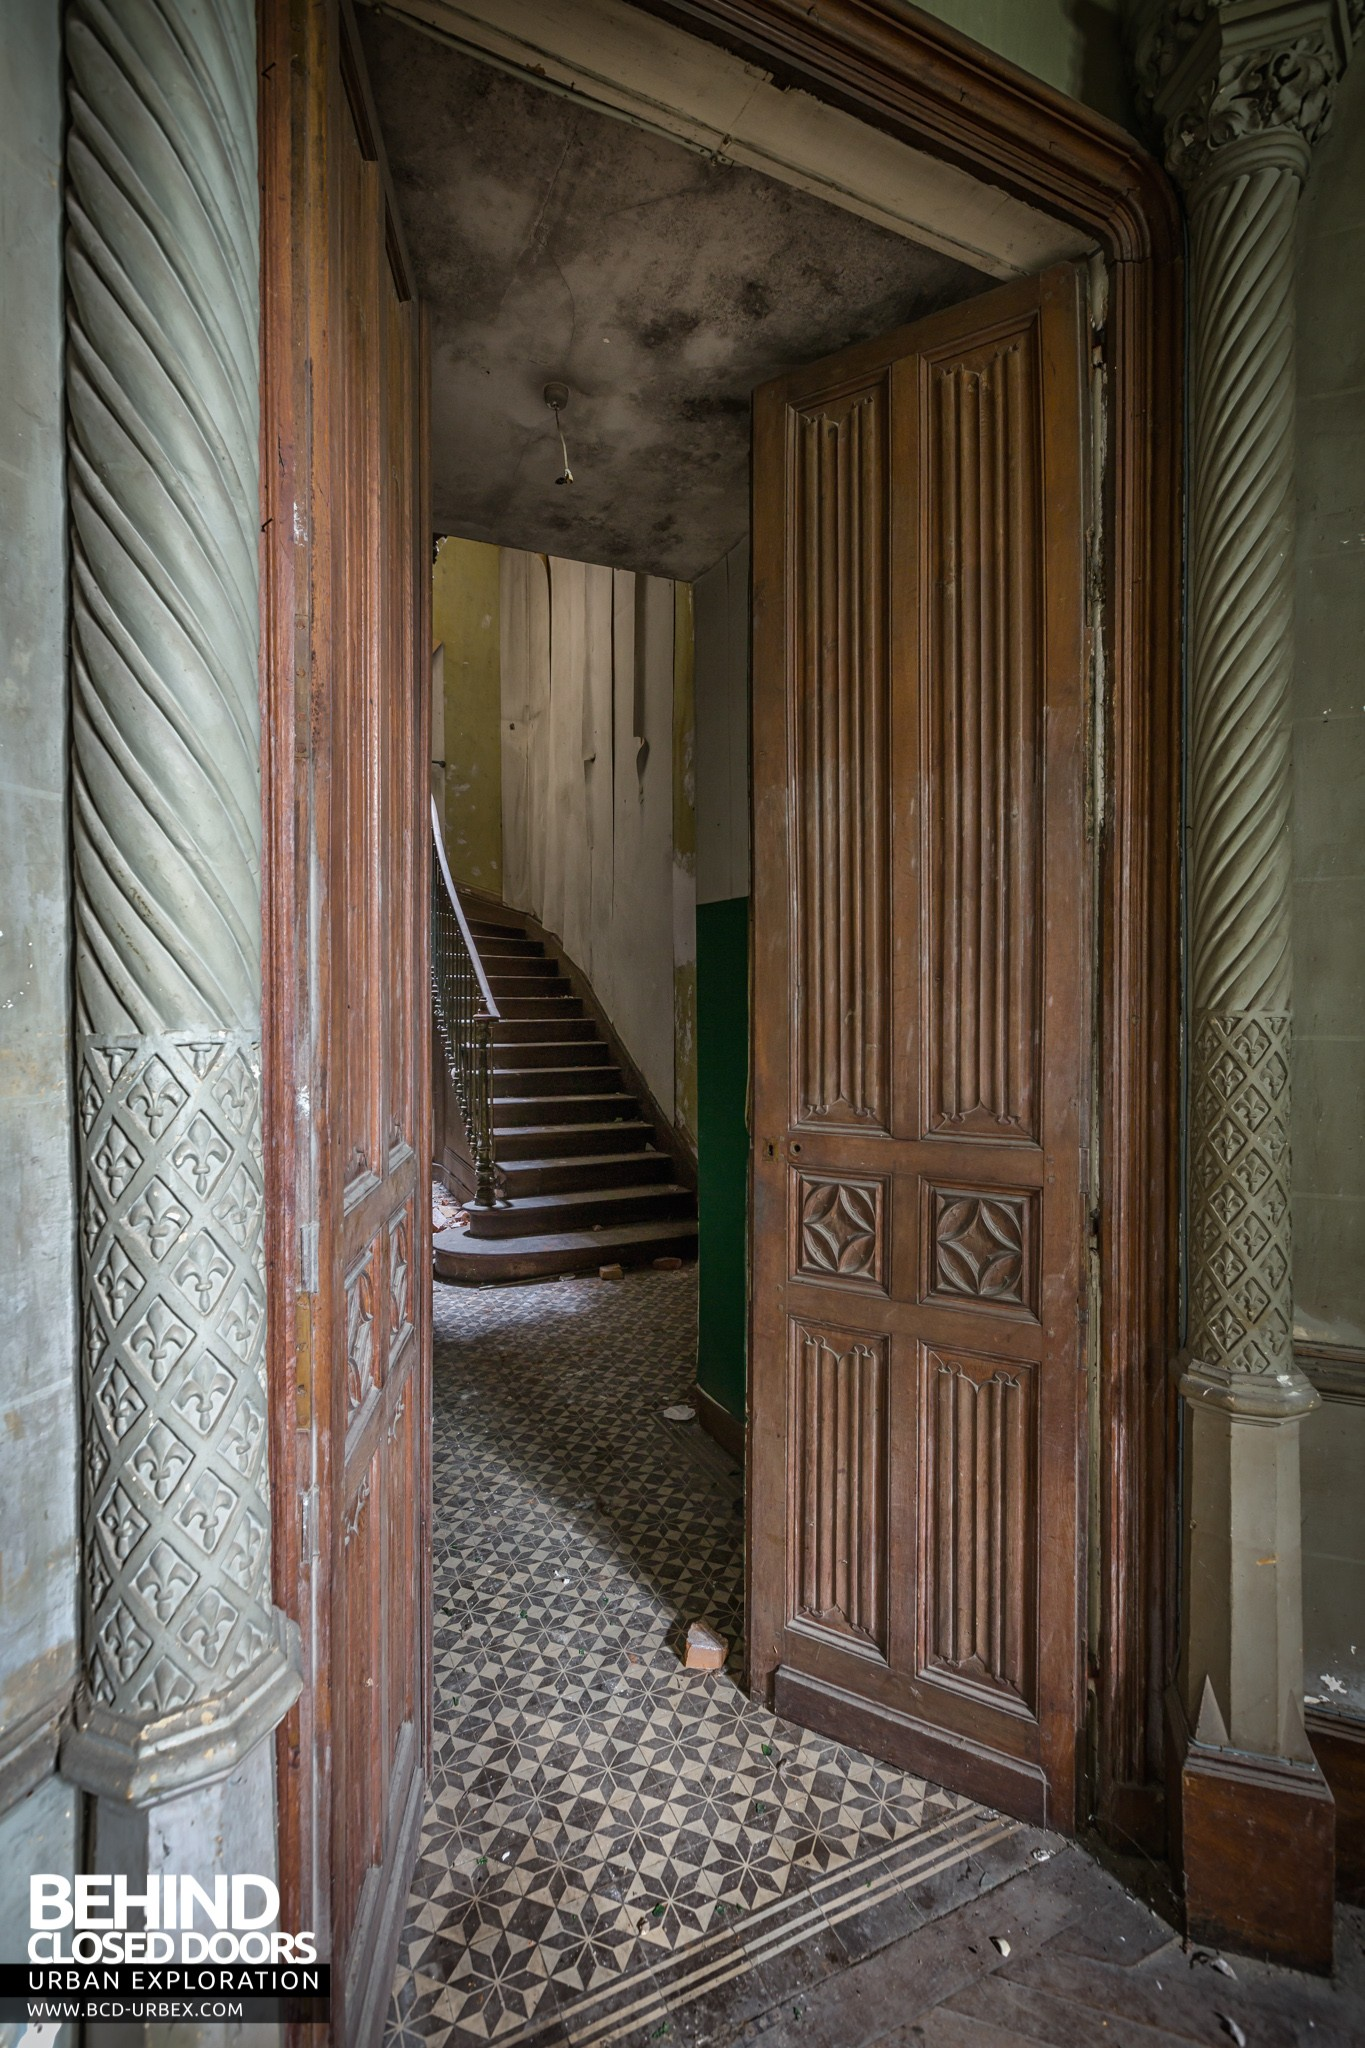 Château des Chimères u2013 Staircase through doors & Château des Chimères France » Urbex | Behind Closed Doors Urban ... pezcame.com